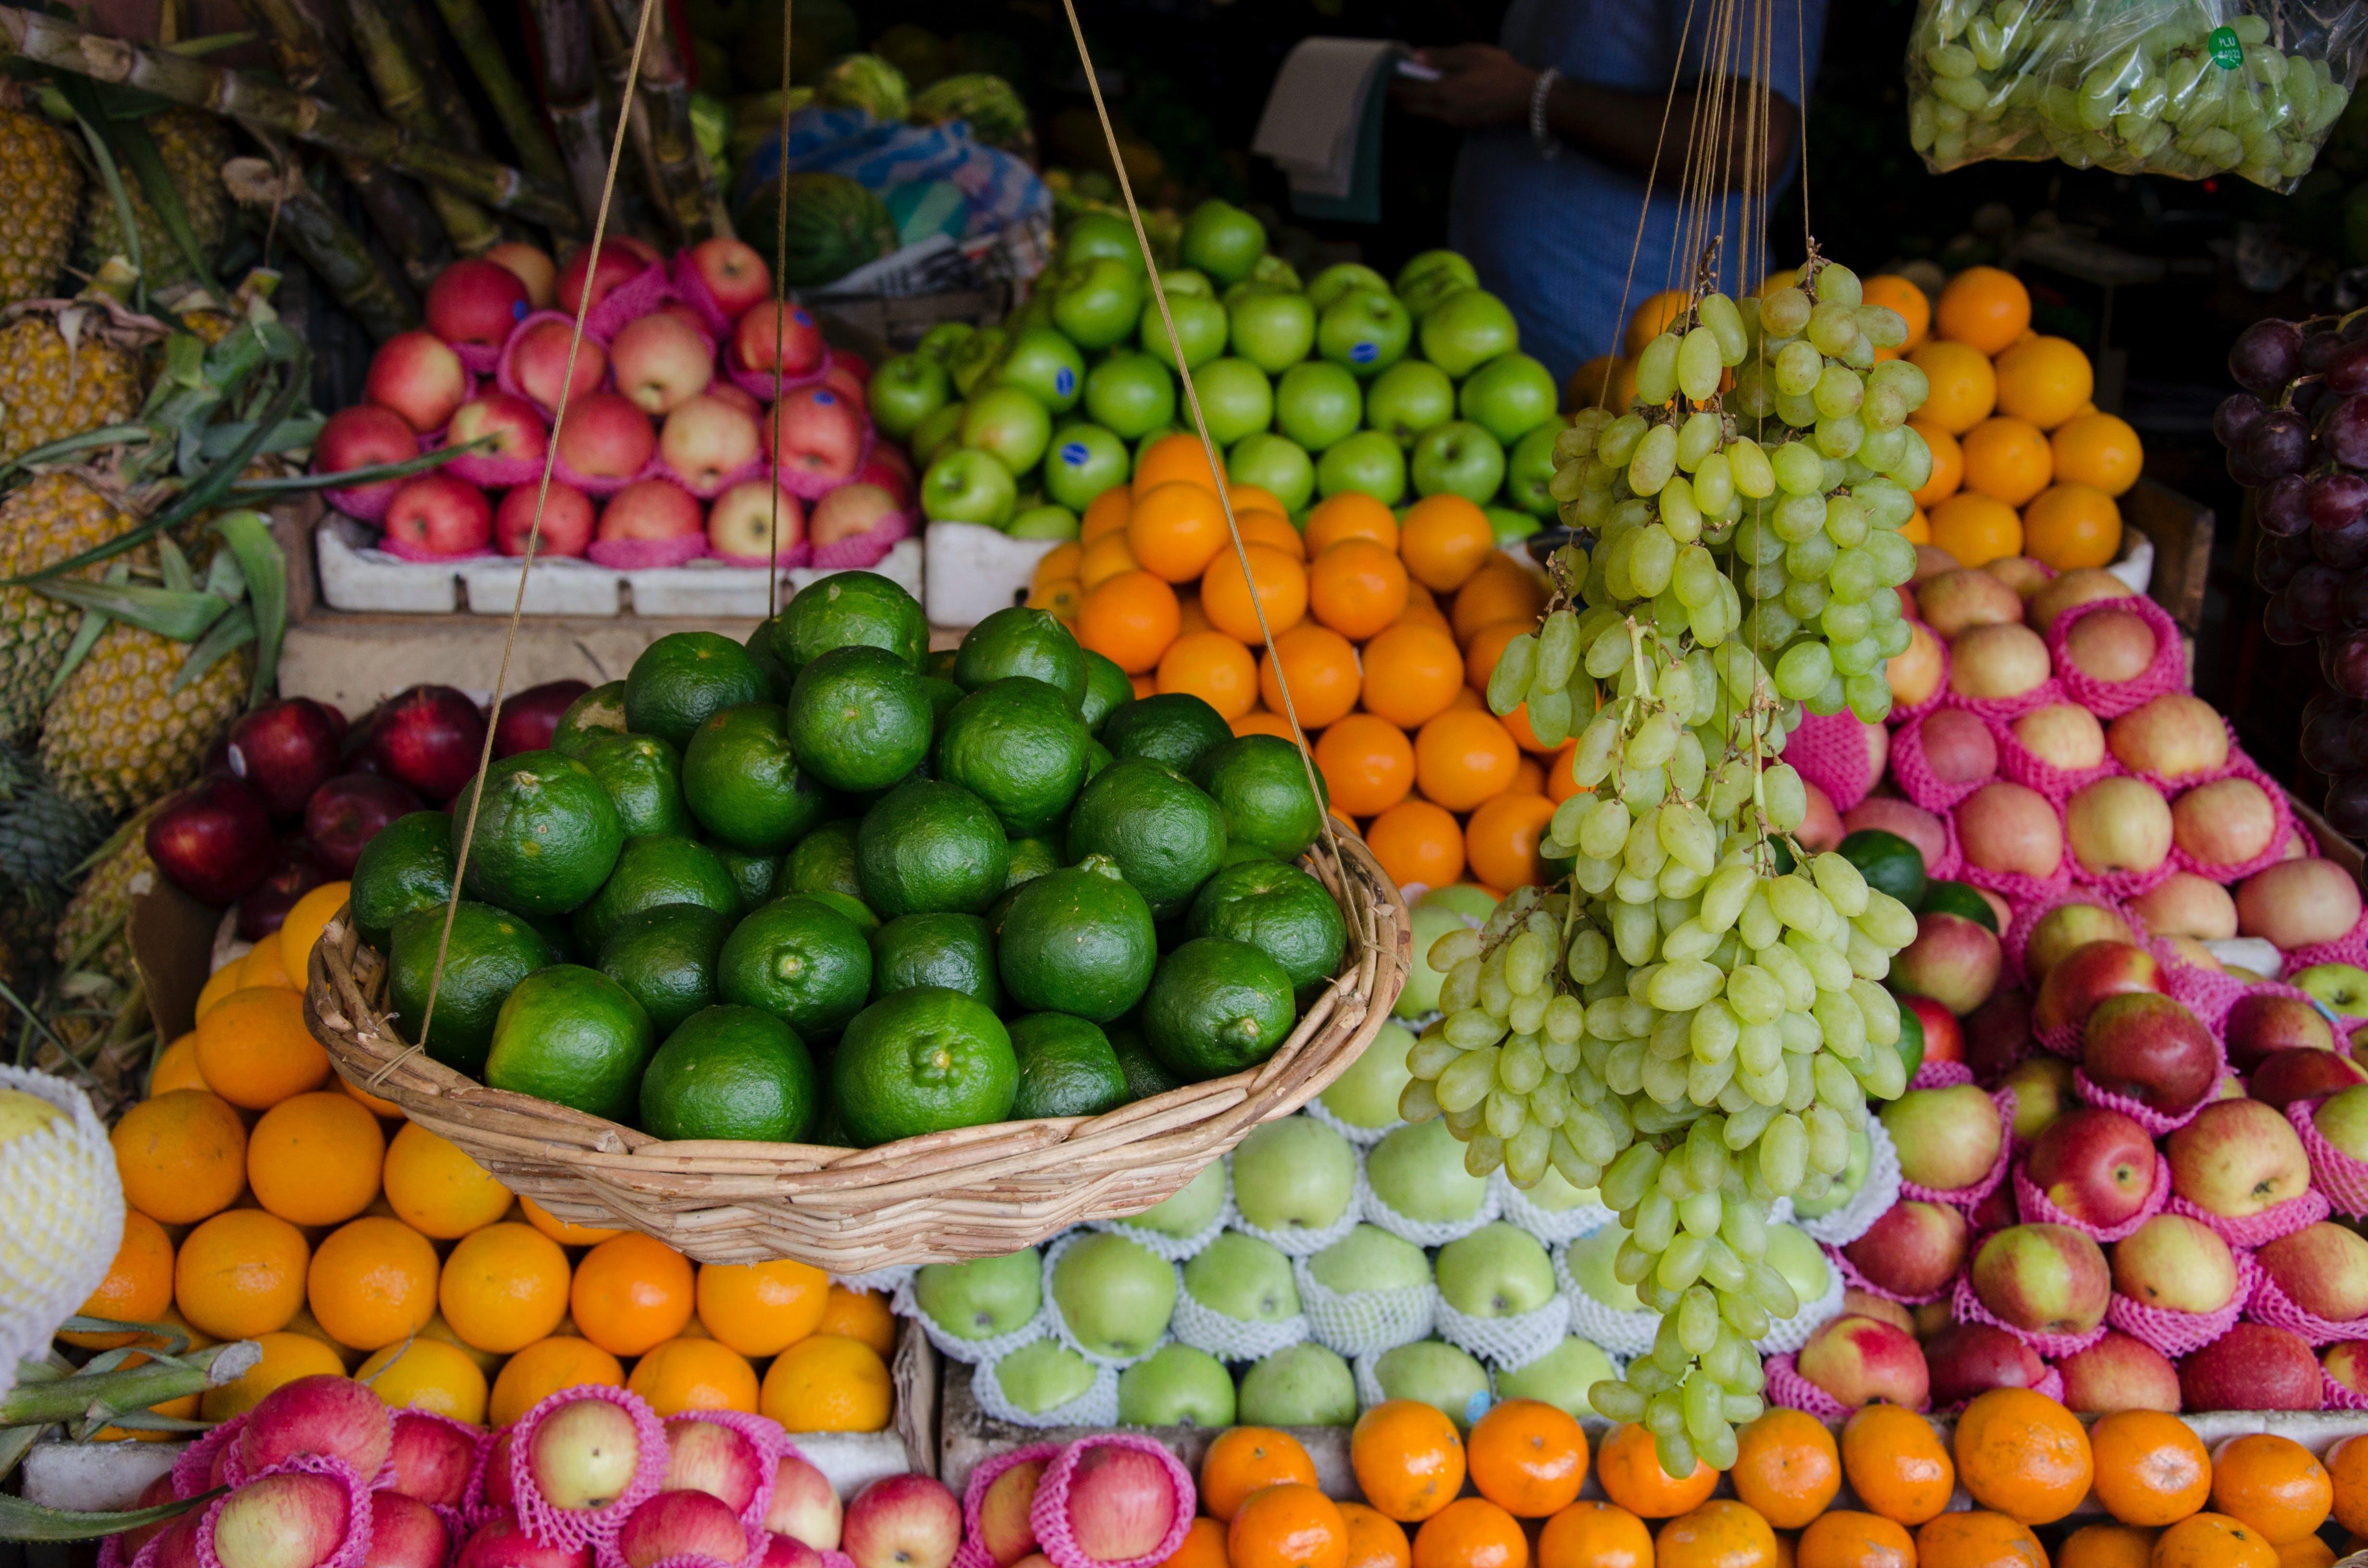 Natural foods,Local food,Whole food,Fruit,Food,Sweetness,Market,Plant,Vegetable,Vegan nutrition